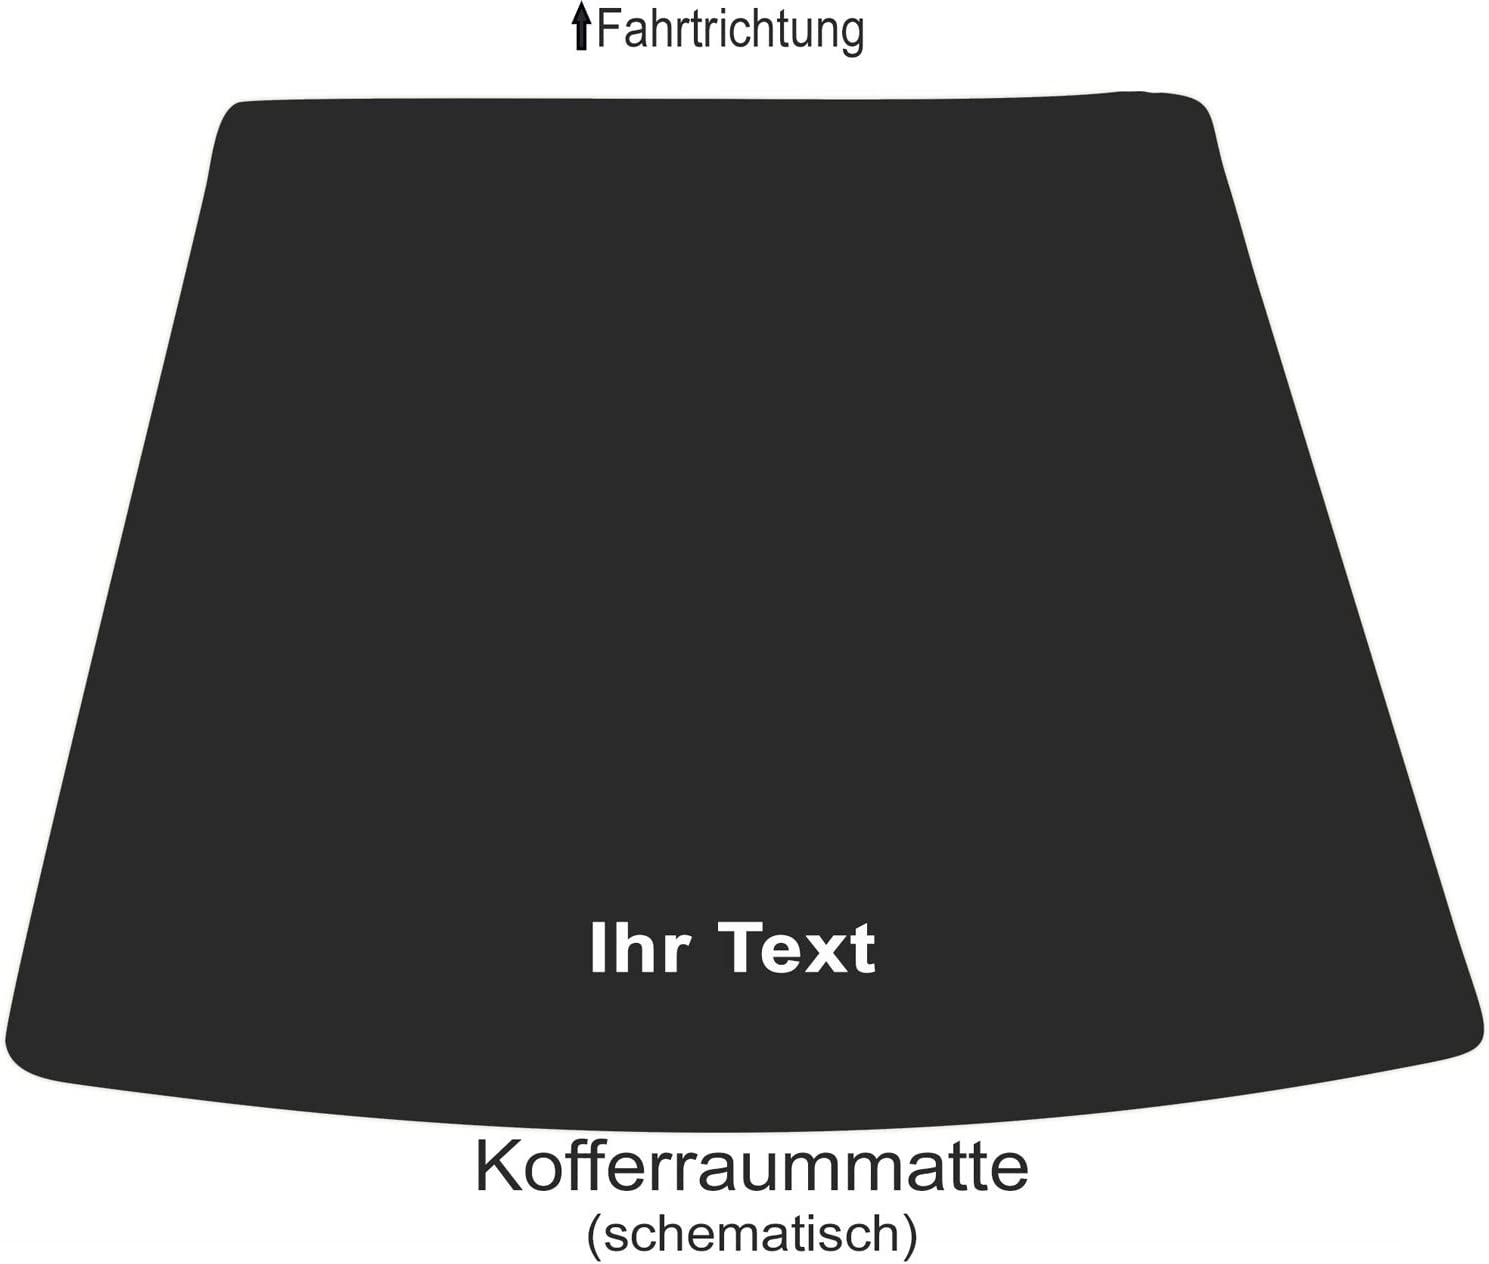 kh Teile Auto Fu/ßmatten B-E90 Bestickt mit Text Namen Werbung usw Lieferumfang: 2-teilig Fahrer + Beifahrer hochwertige Velour Automatte